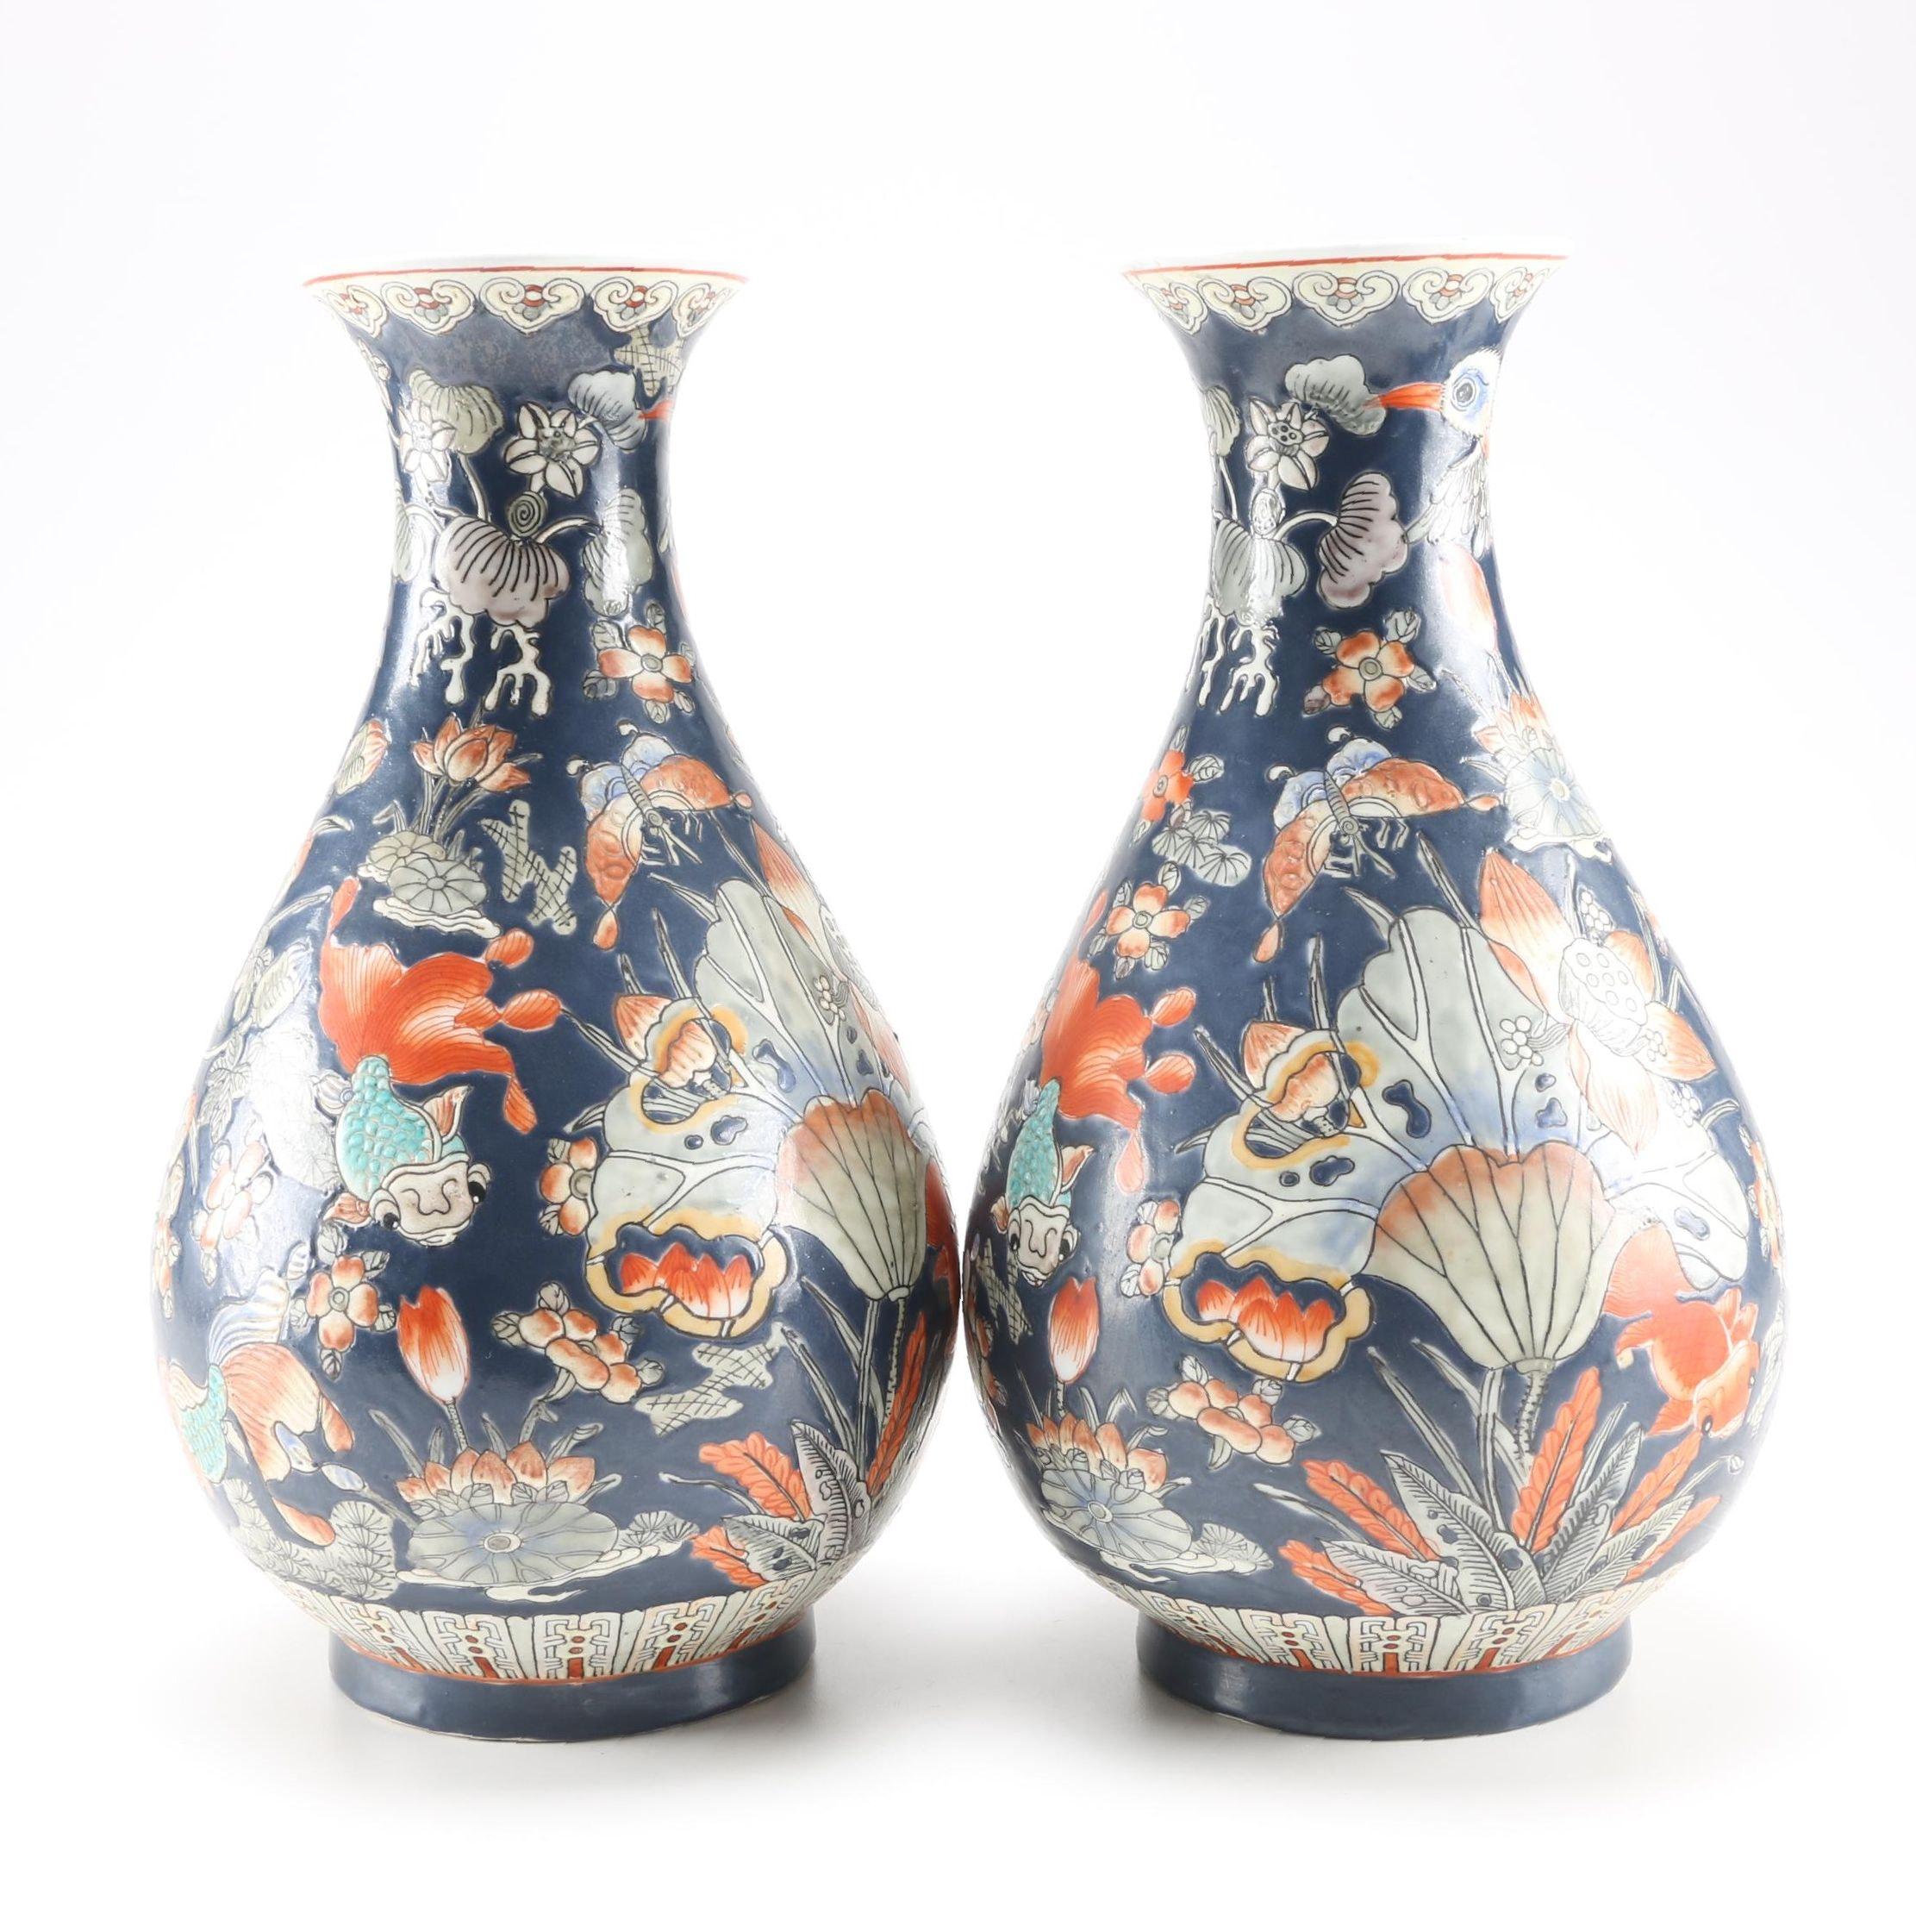 Pair of Large Chinese Ceramic Vases